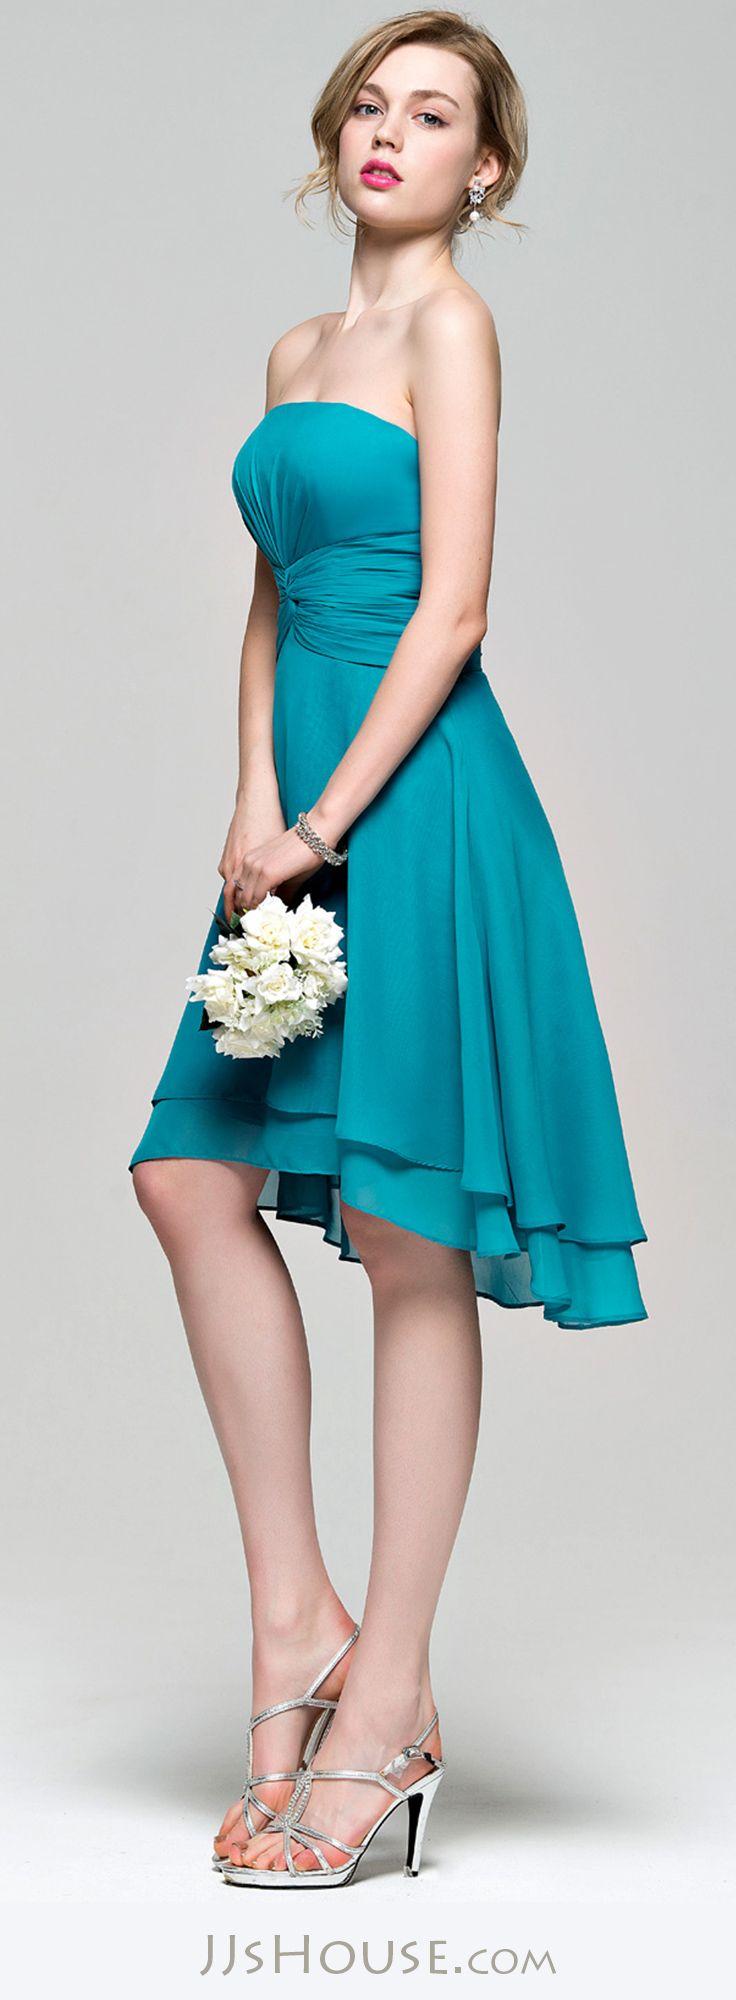 Fantastic Rockabilly Bridesmaid Dress Gift - All Wedding Dresses ...